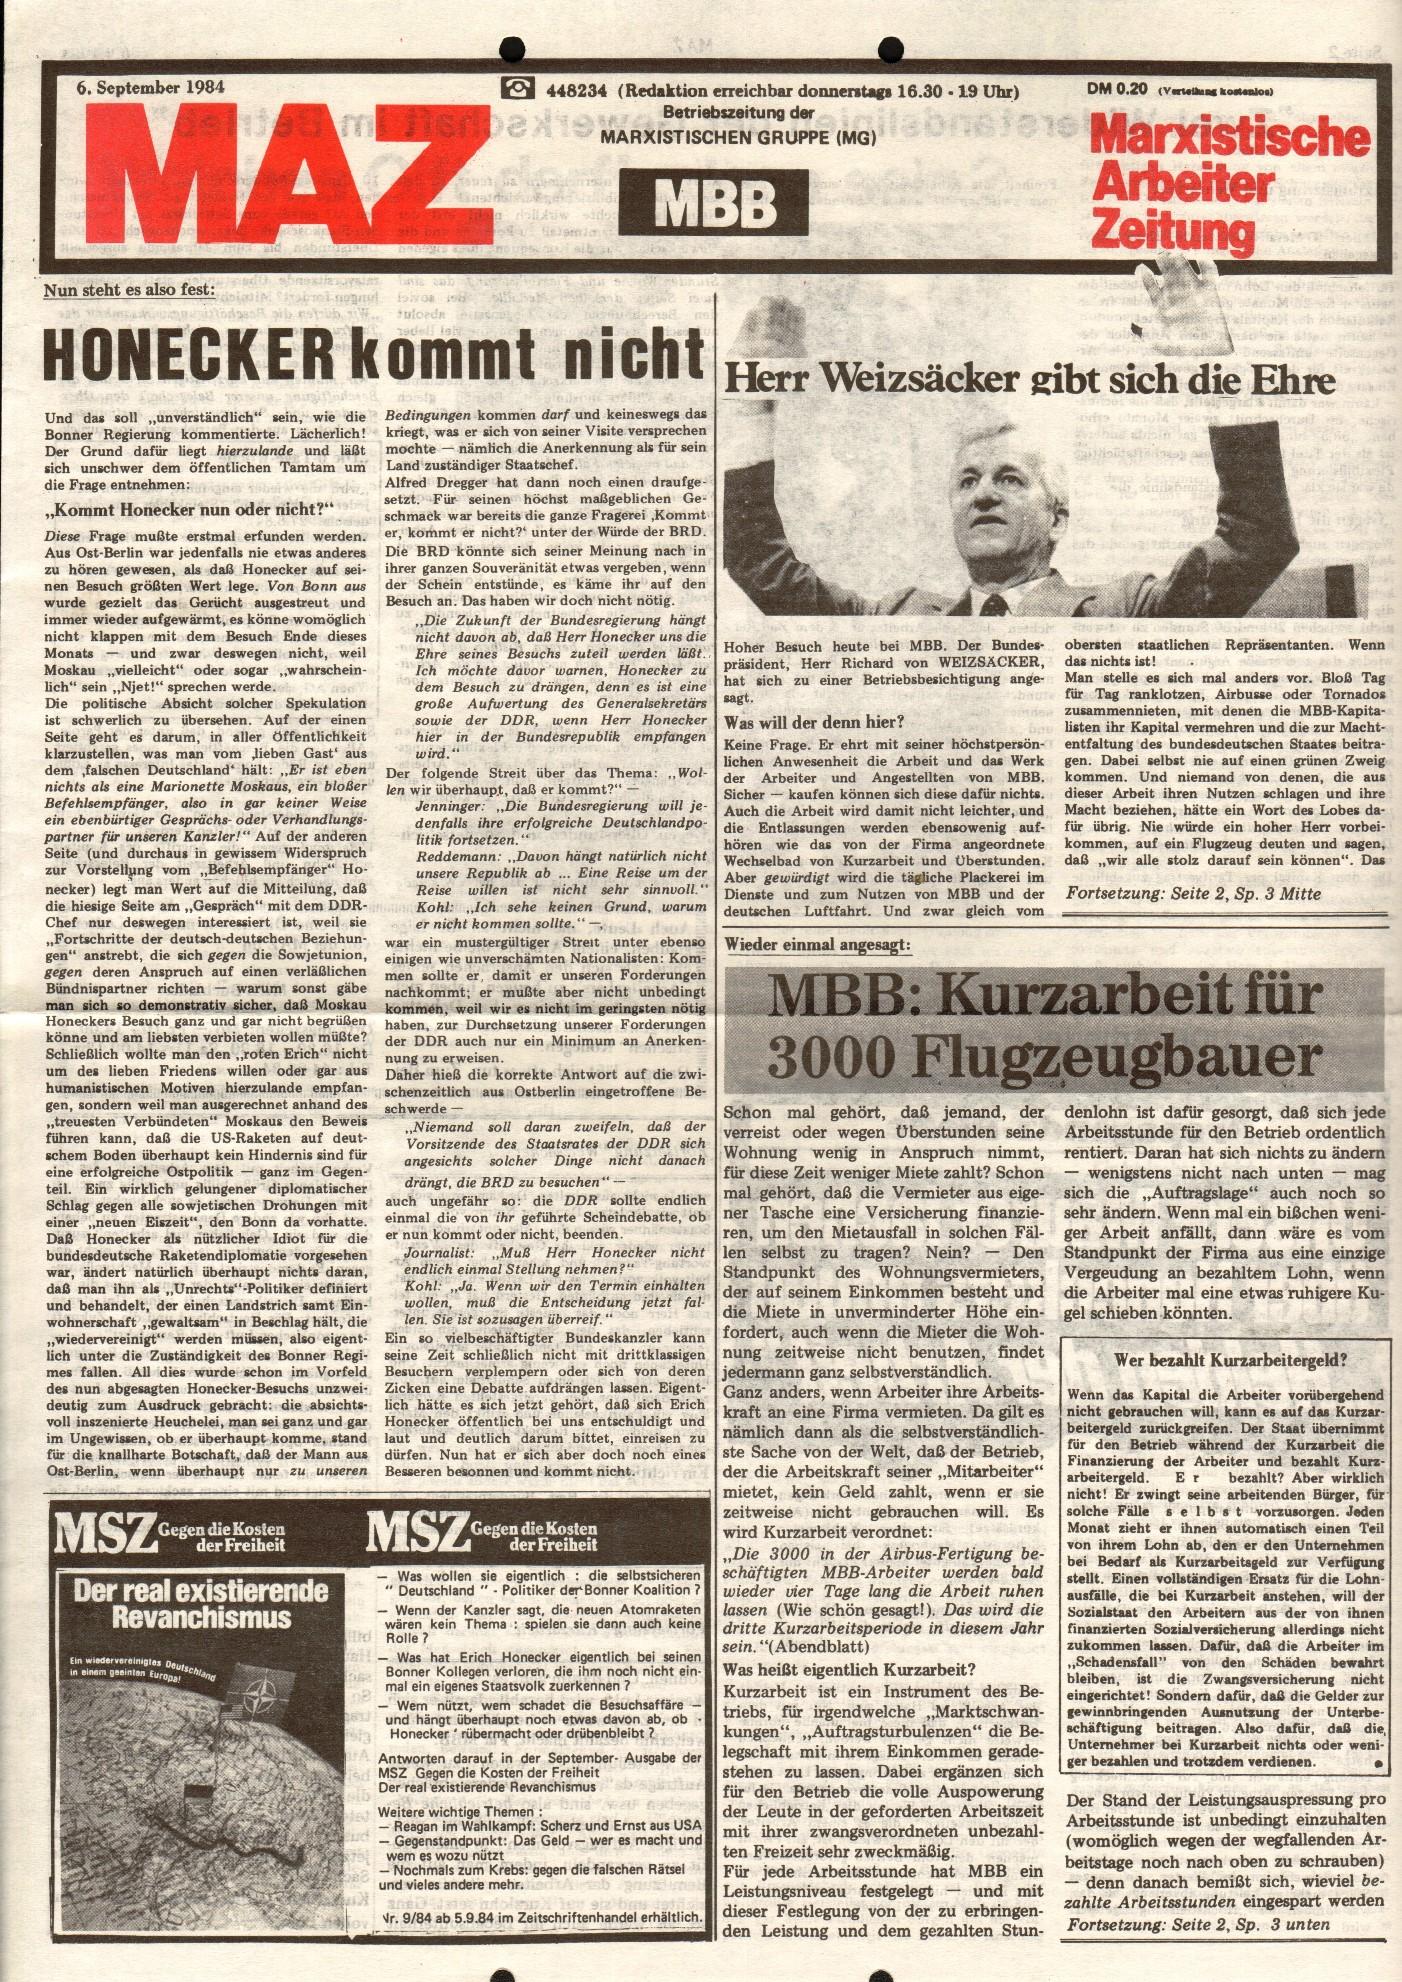 Hamburg_MG_MAZ_MBB_19840906_01